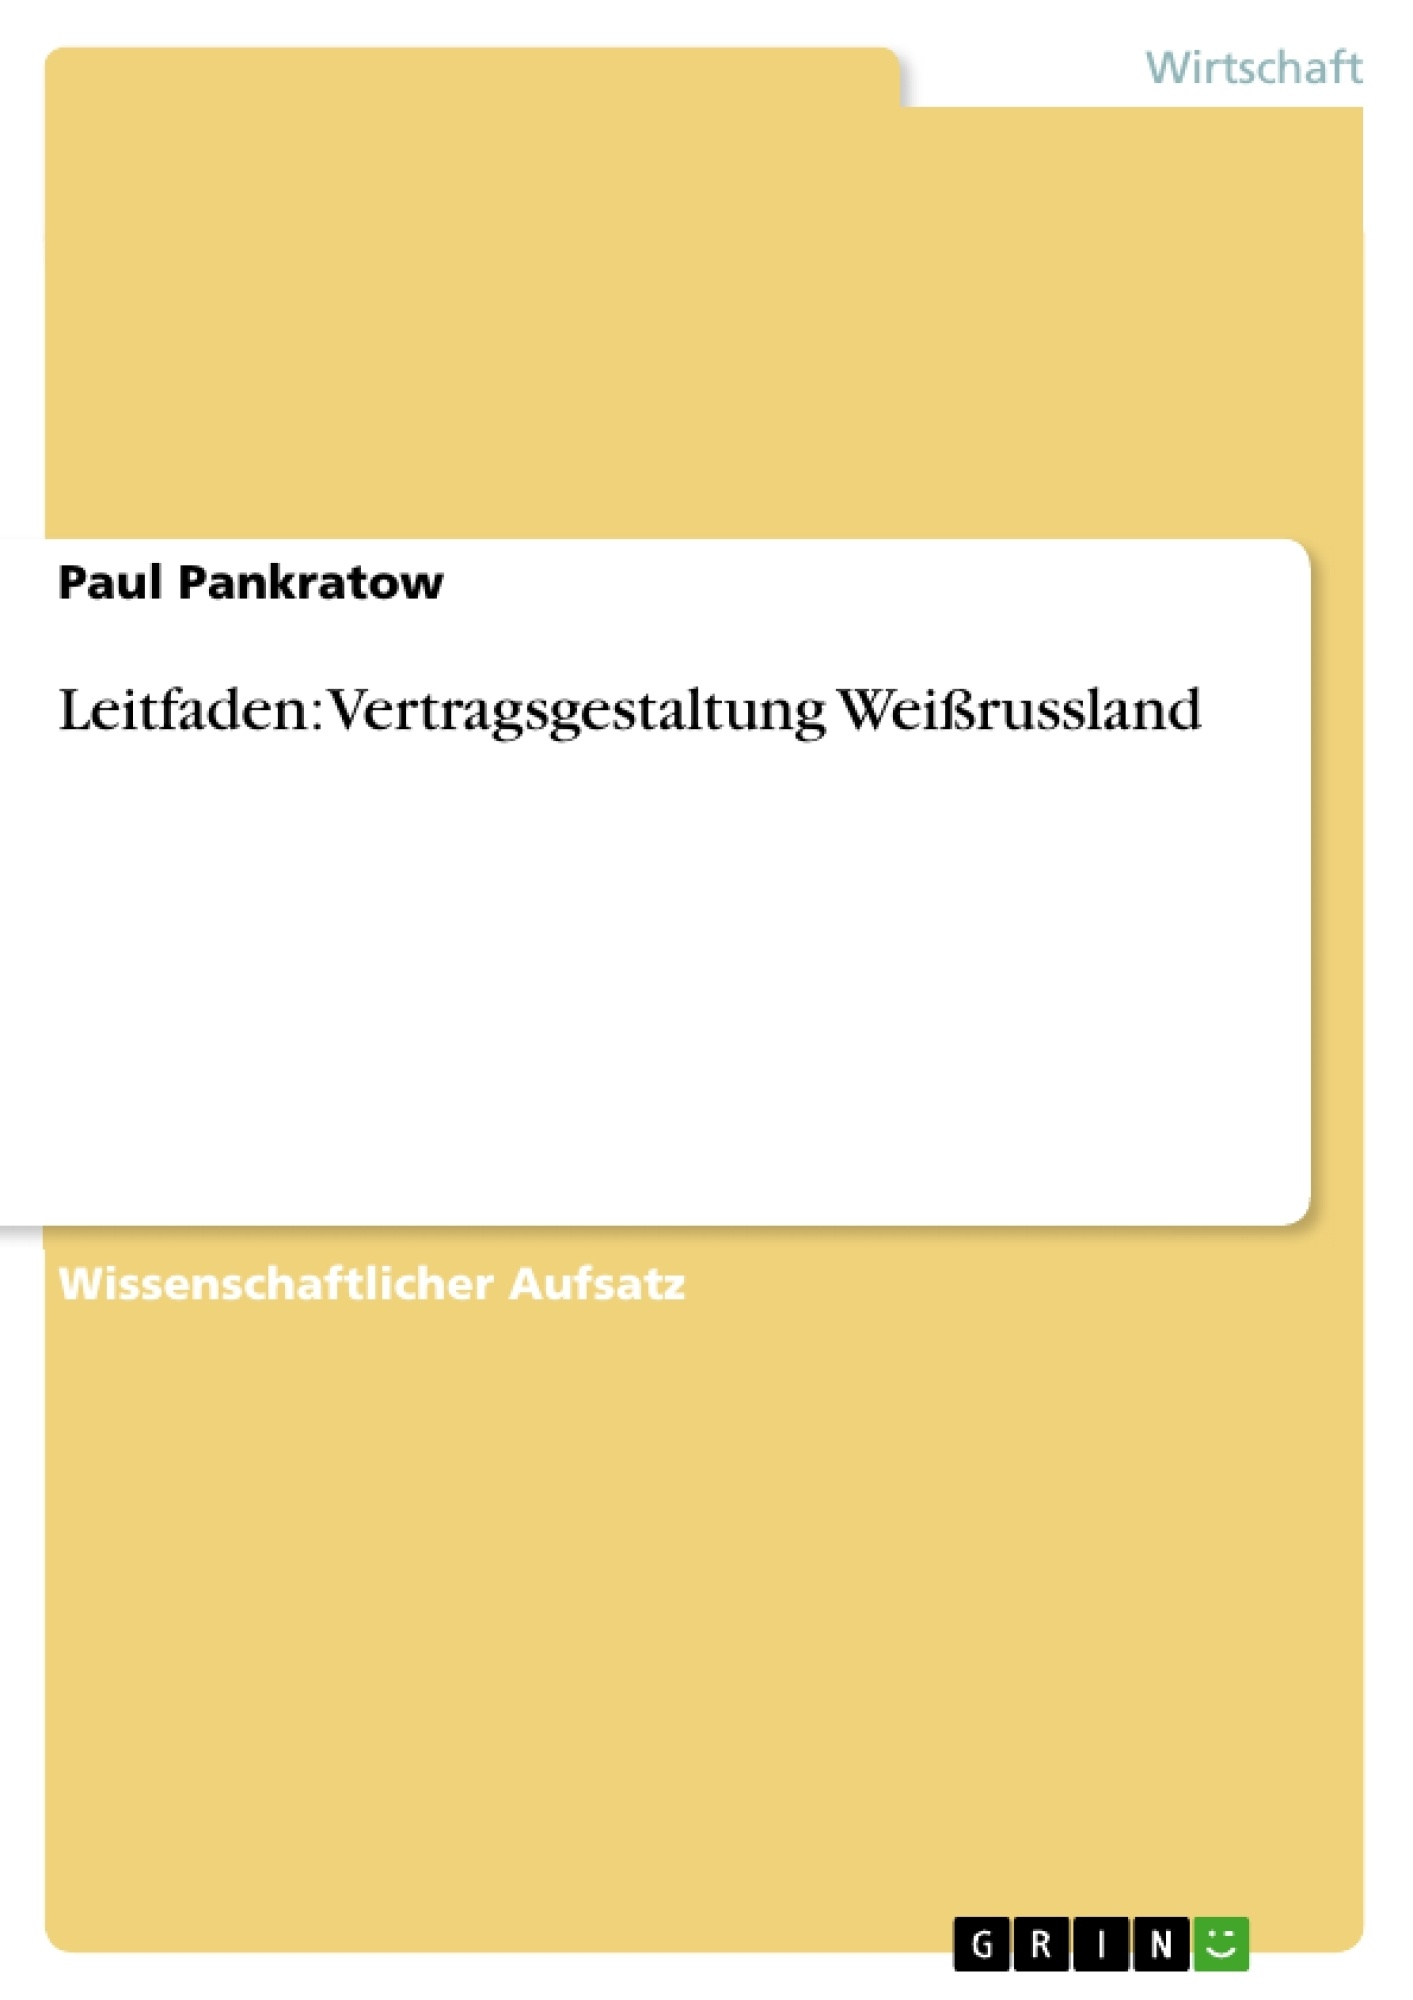 Titel: Leitfaden: Vertragsgestaltung Weißrussland